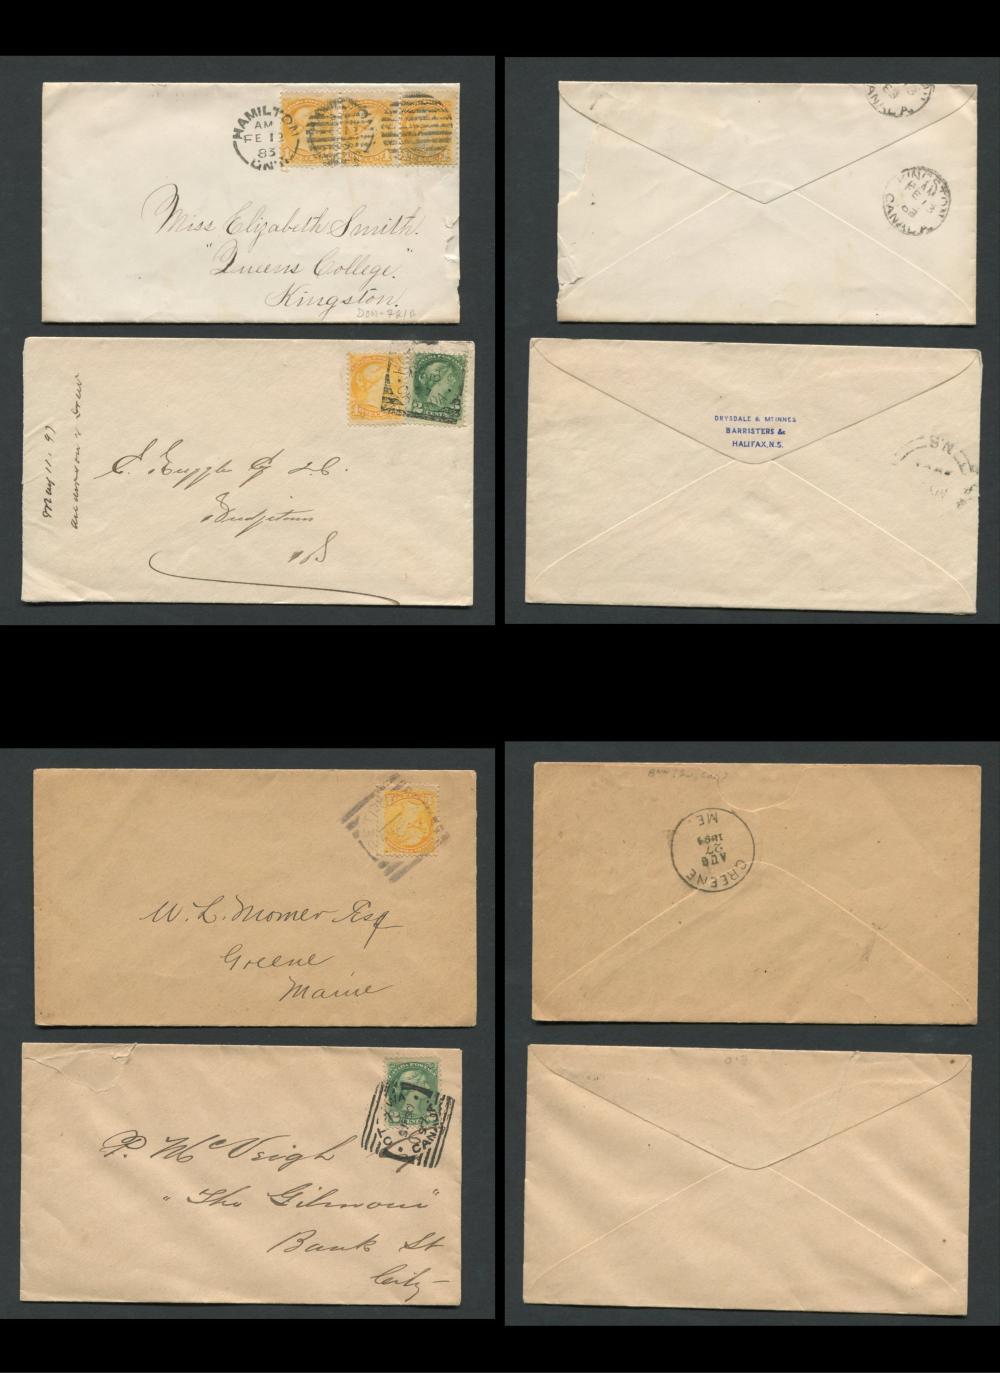 Canada Victoria Stamp Covers 15